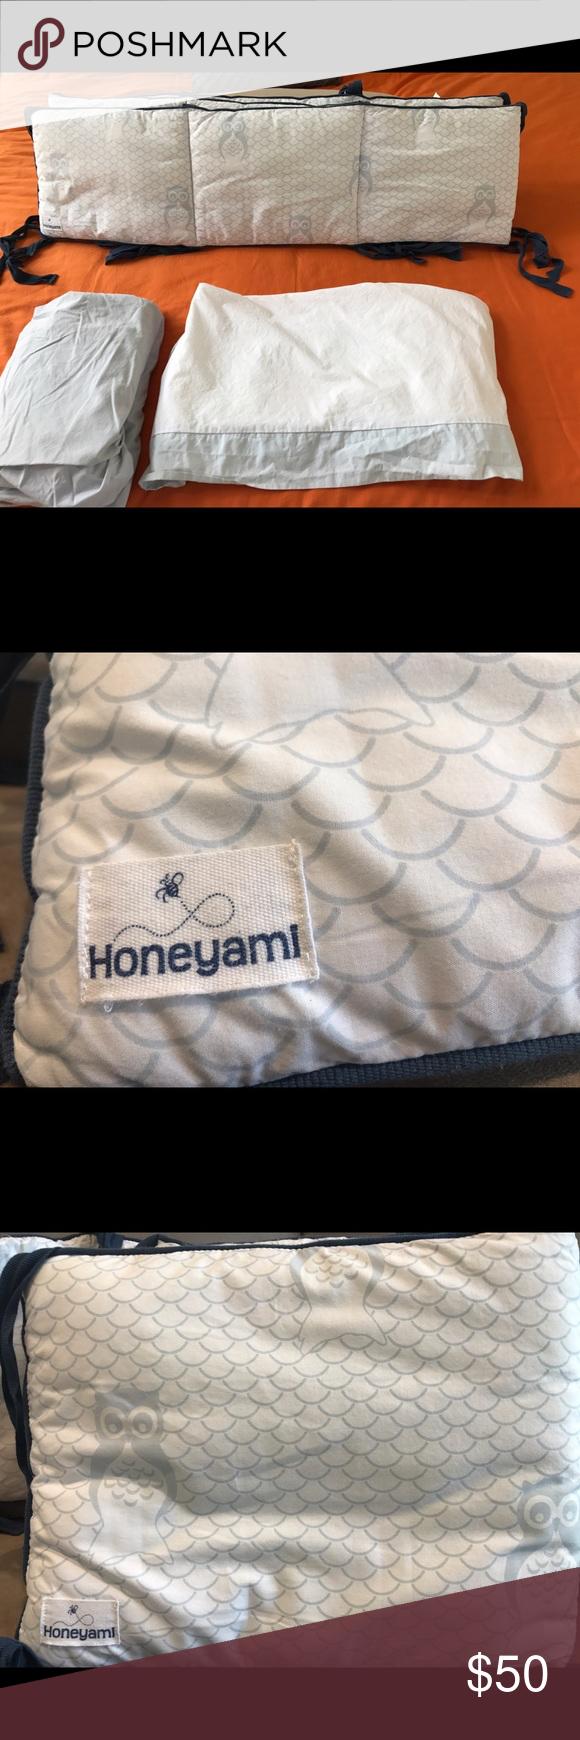 d olast chance d ohoneyami organic crib bumper skirt night owl